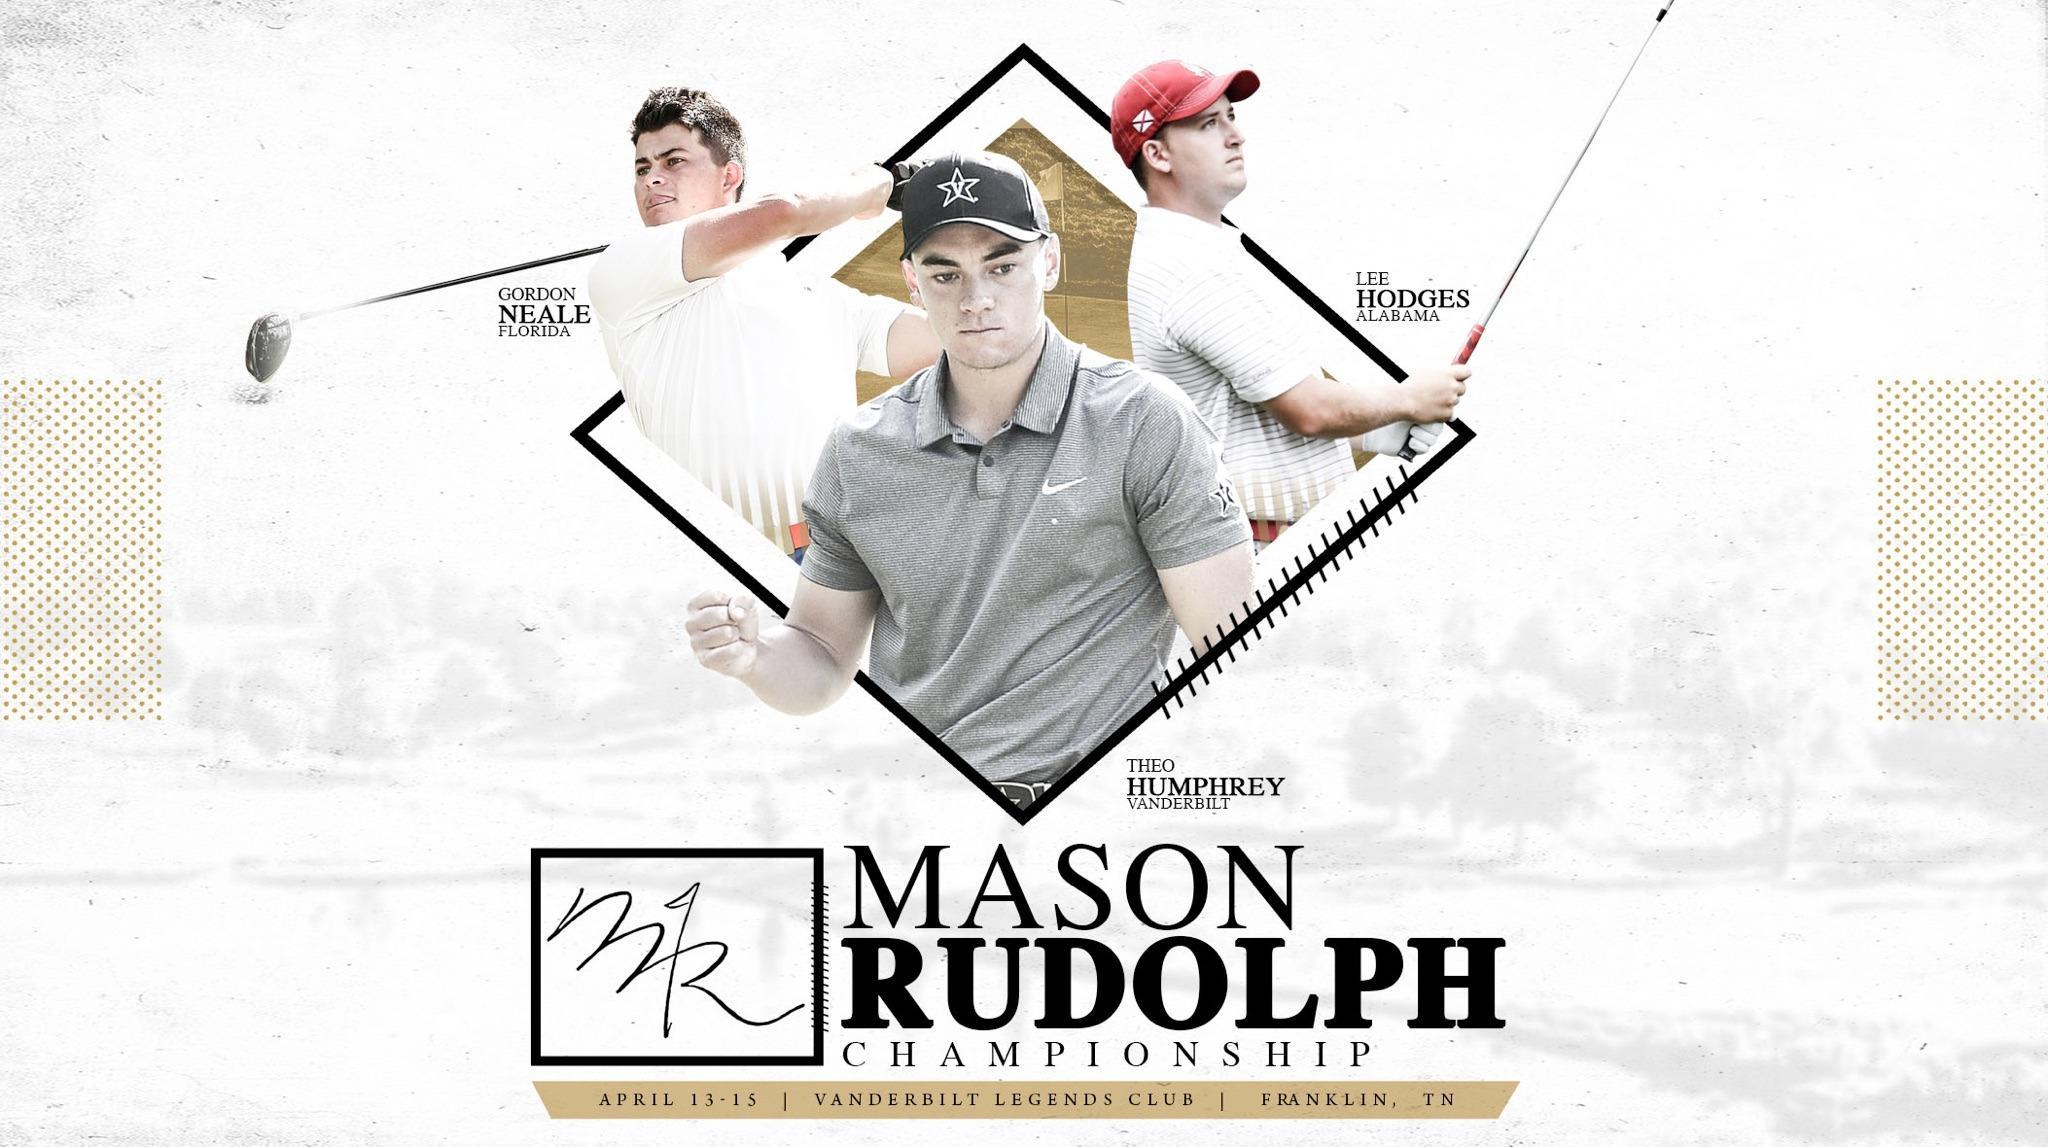 Men's Golf riding high going into Mason Rudolph Championship